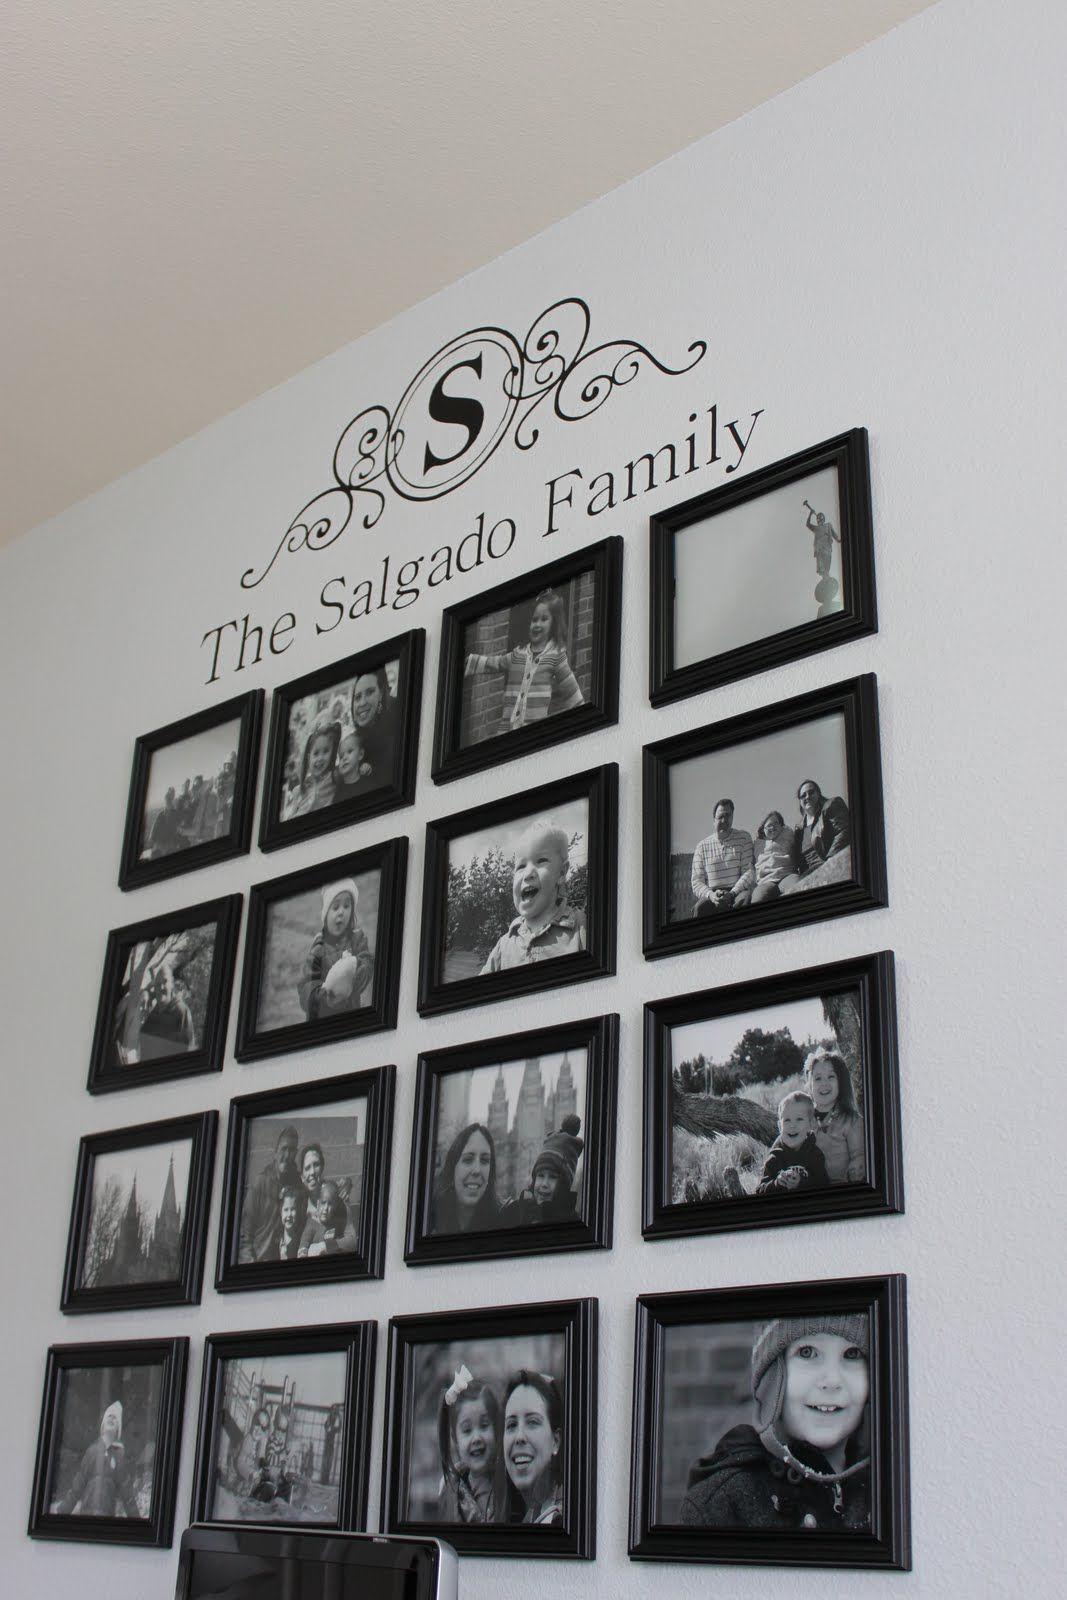 Fotos de familia | Detalles y Materiales | Pinterest | Stammbaum ...